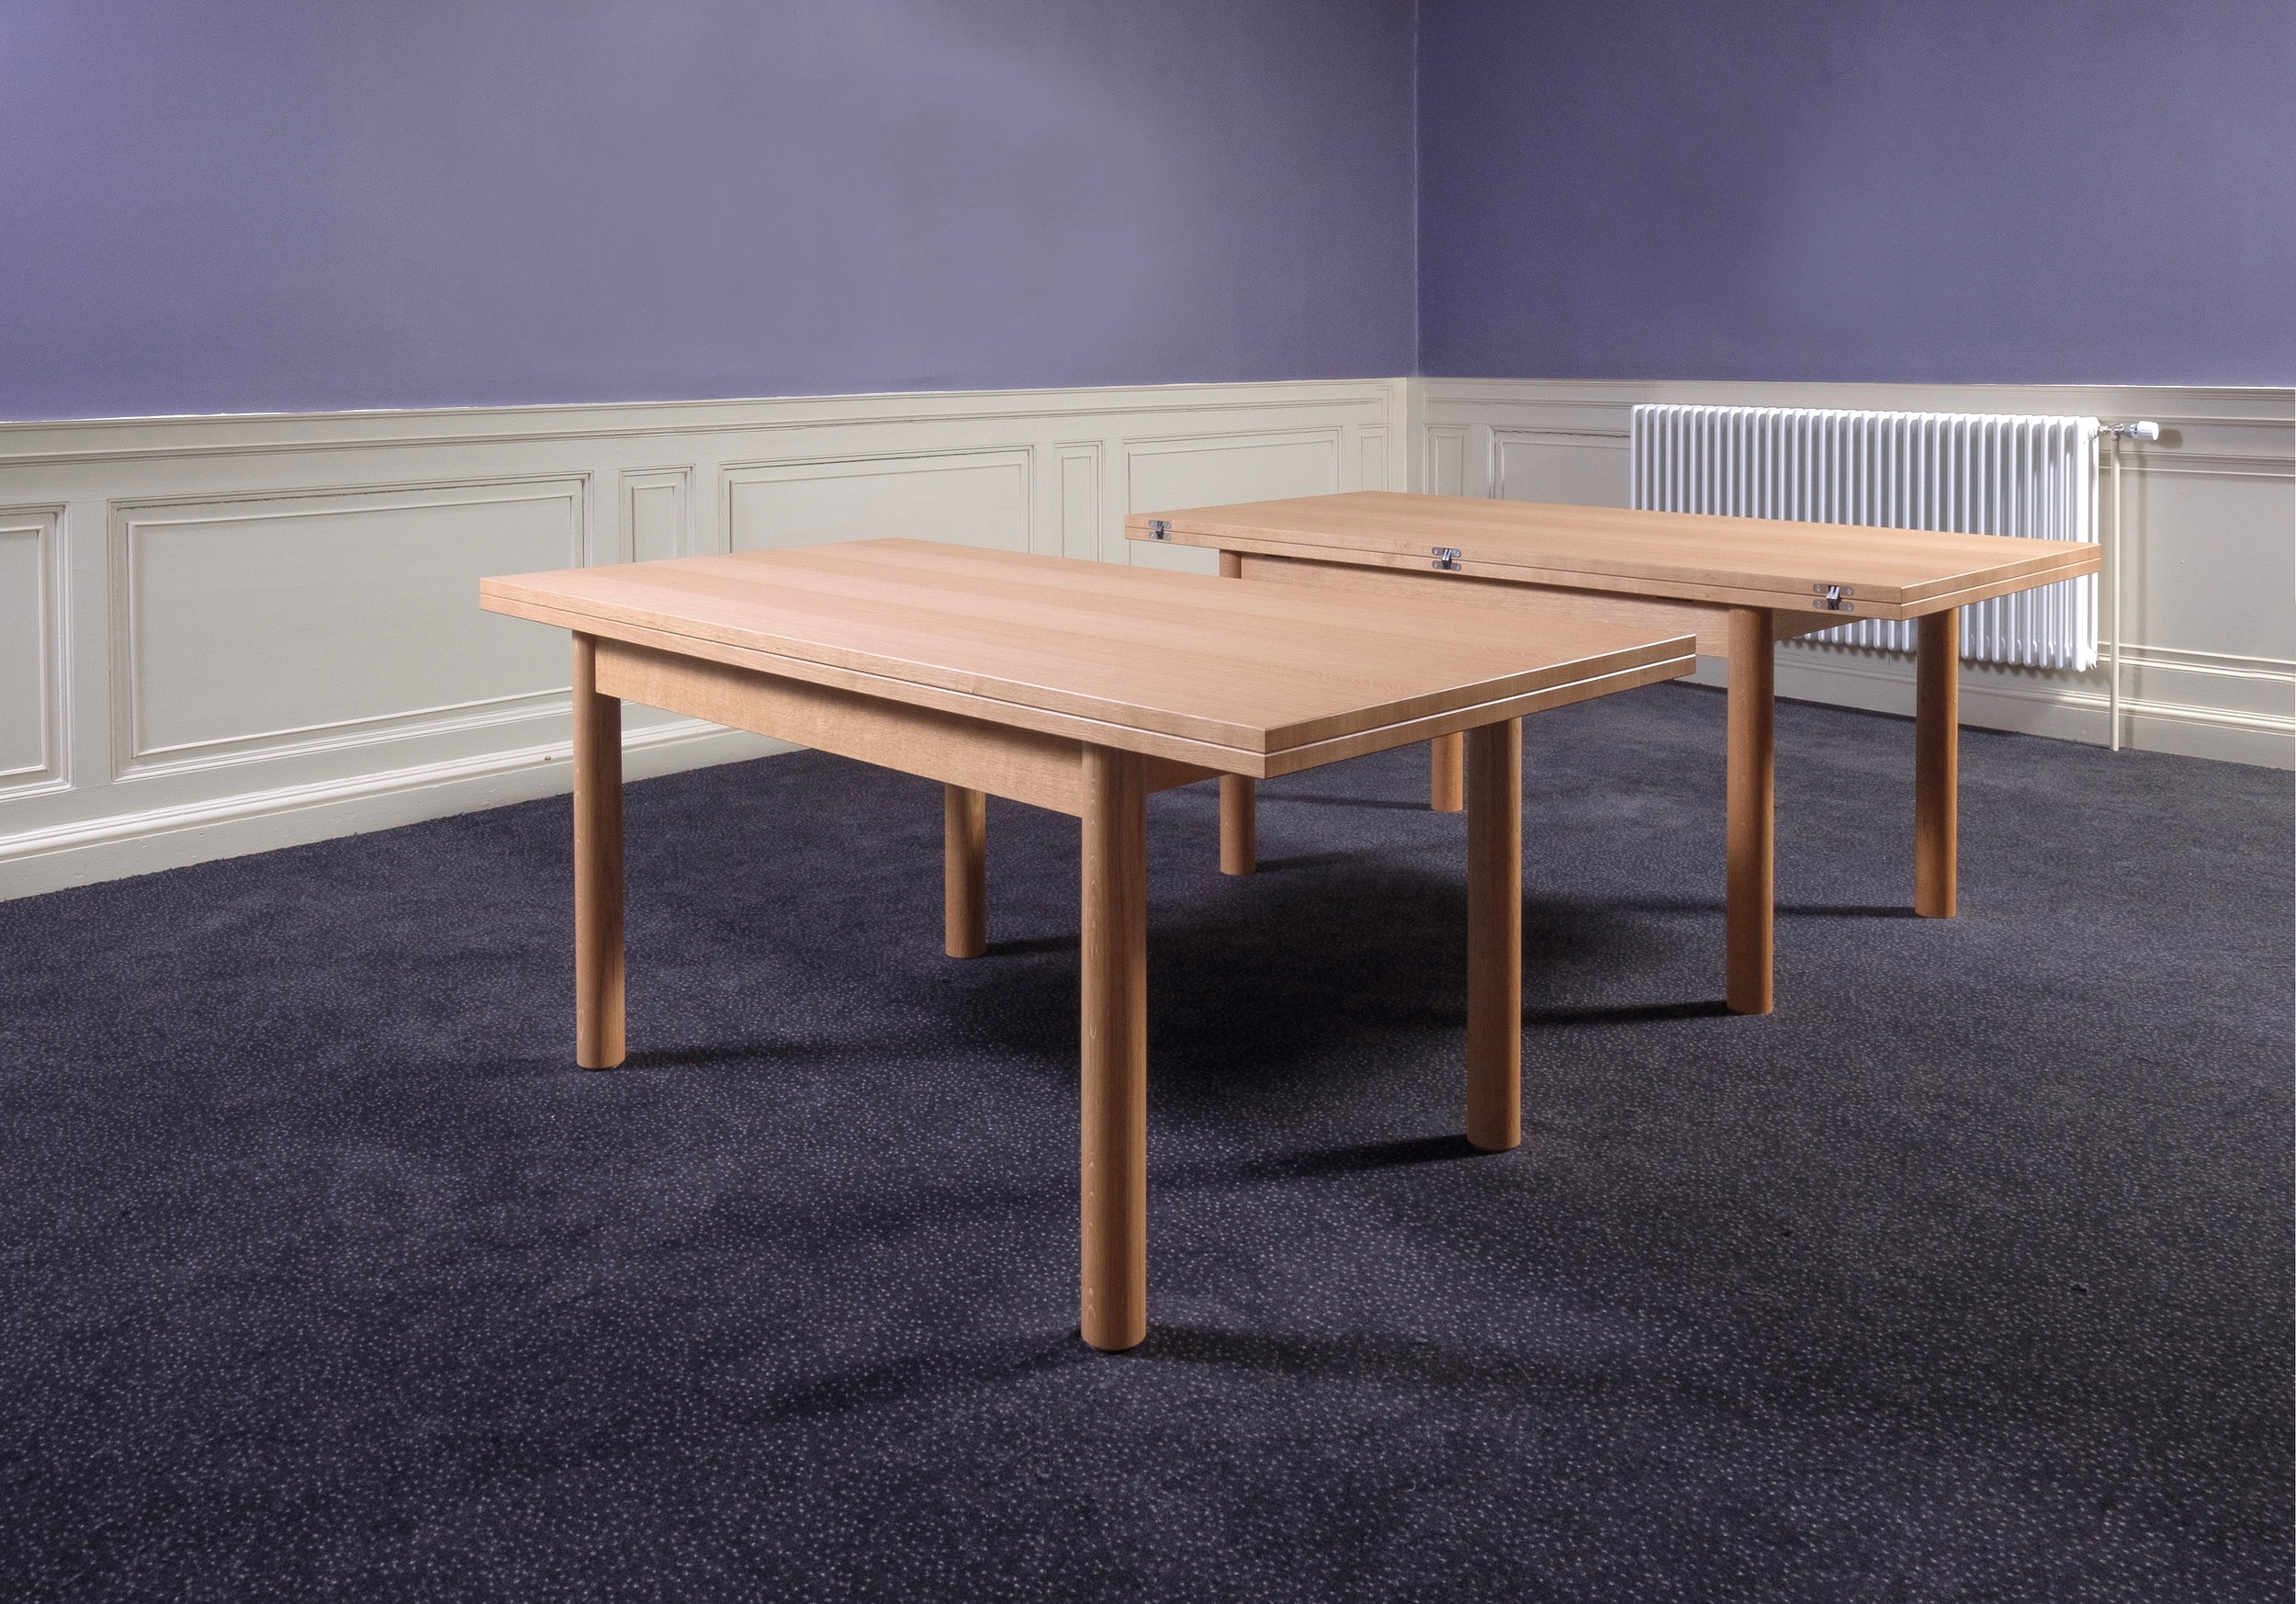 Edinburgh Law School Boardroom Table and Chairs